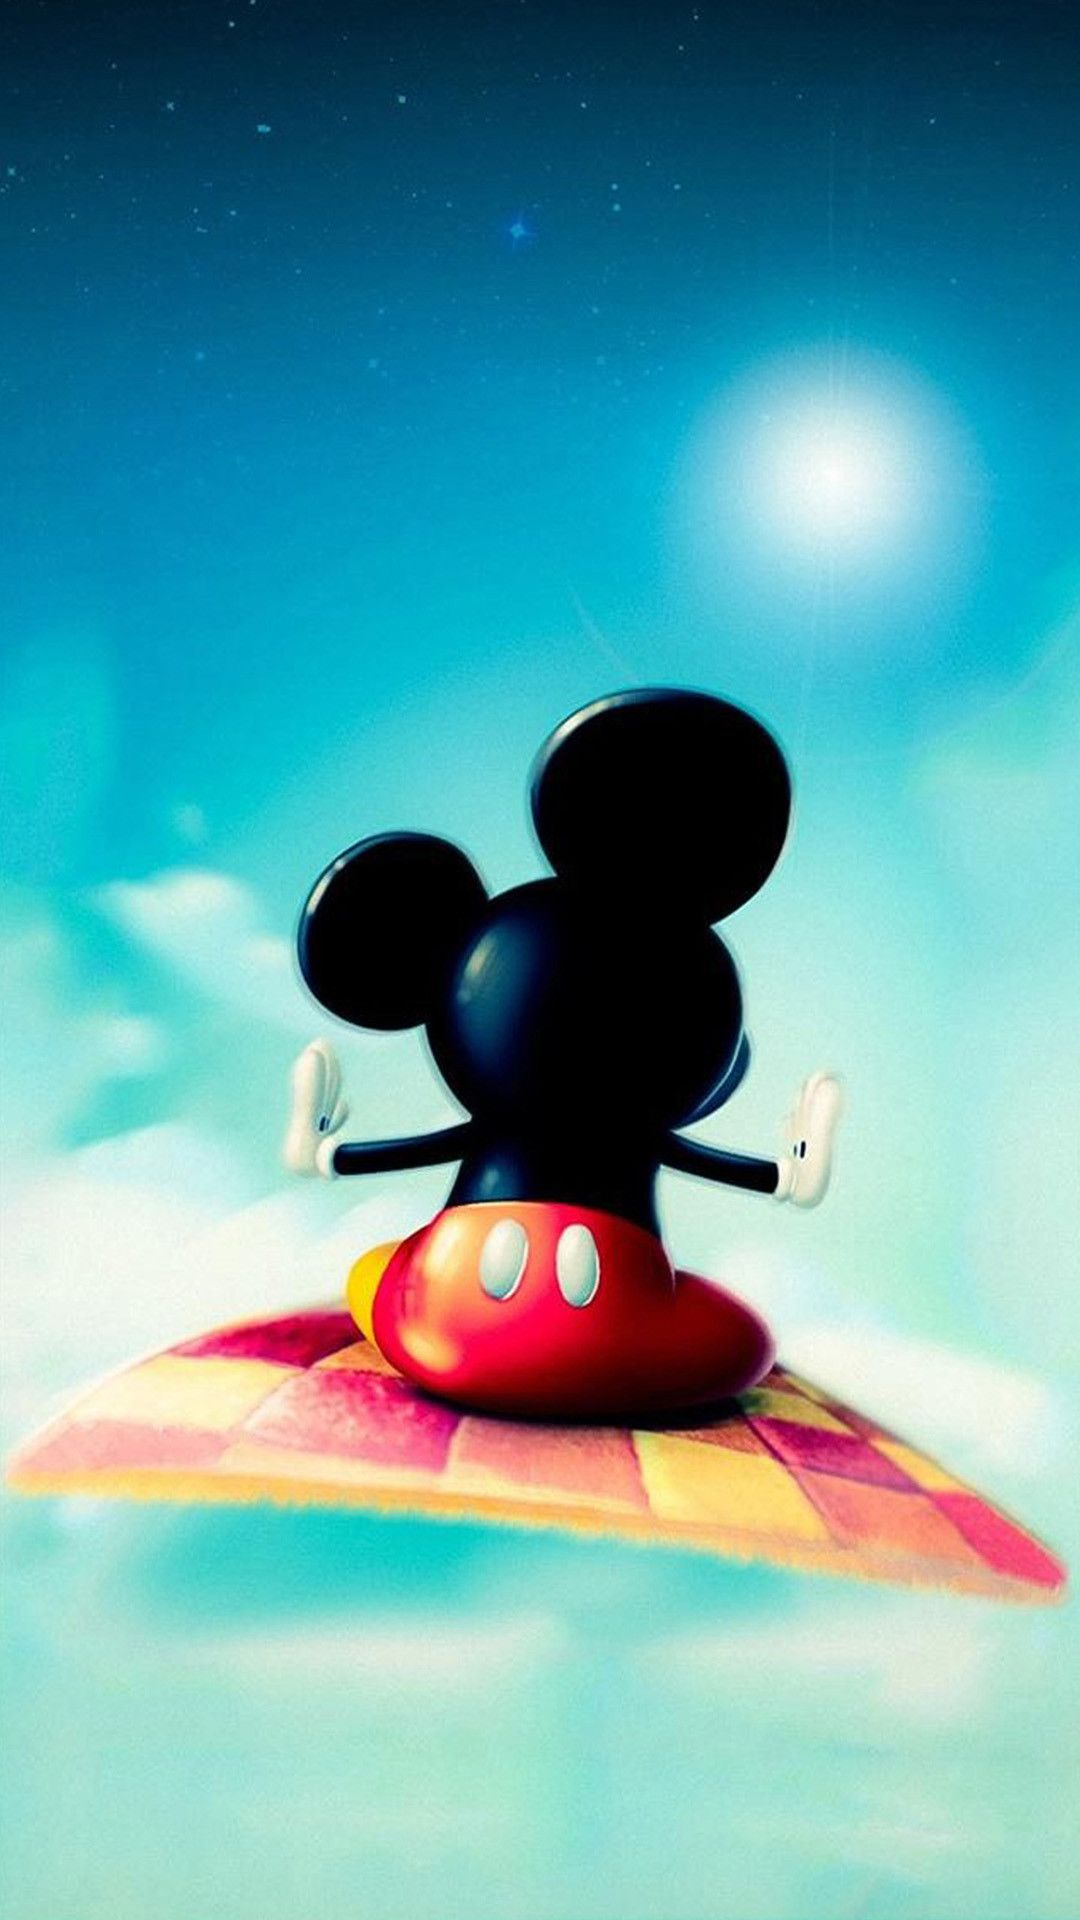 3d Cute Disney Wallpapers Top Free 3d Cute Disney Backgrounds